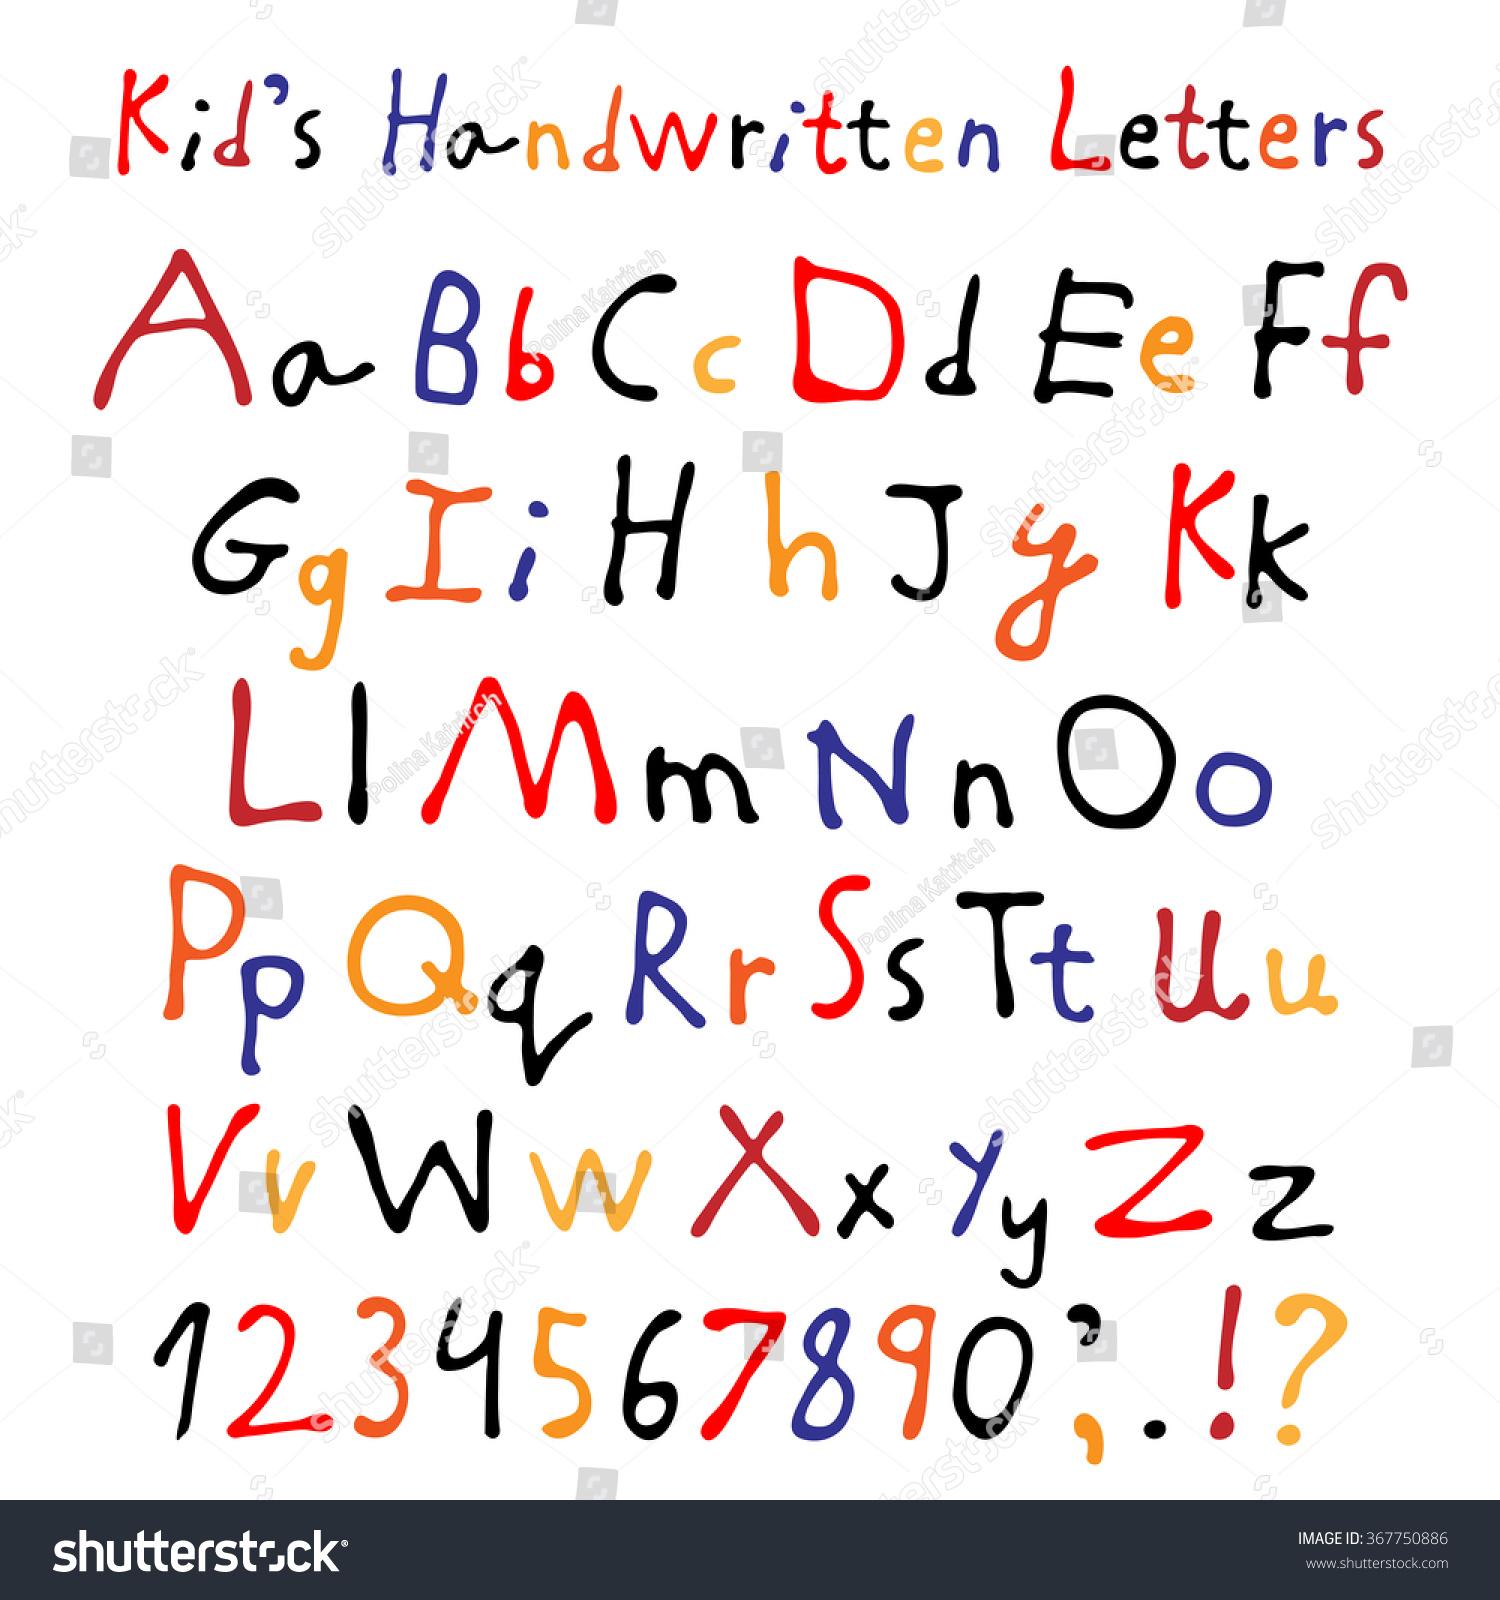 Worksheets Script Alphabet For Kids kids handwritten letters full alphabet numbers stock vector and childrens script font